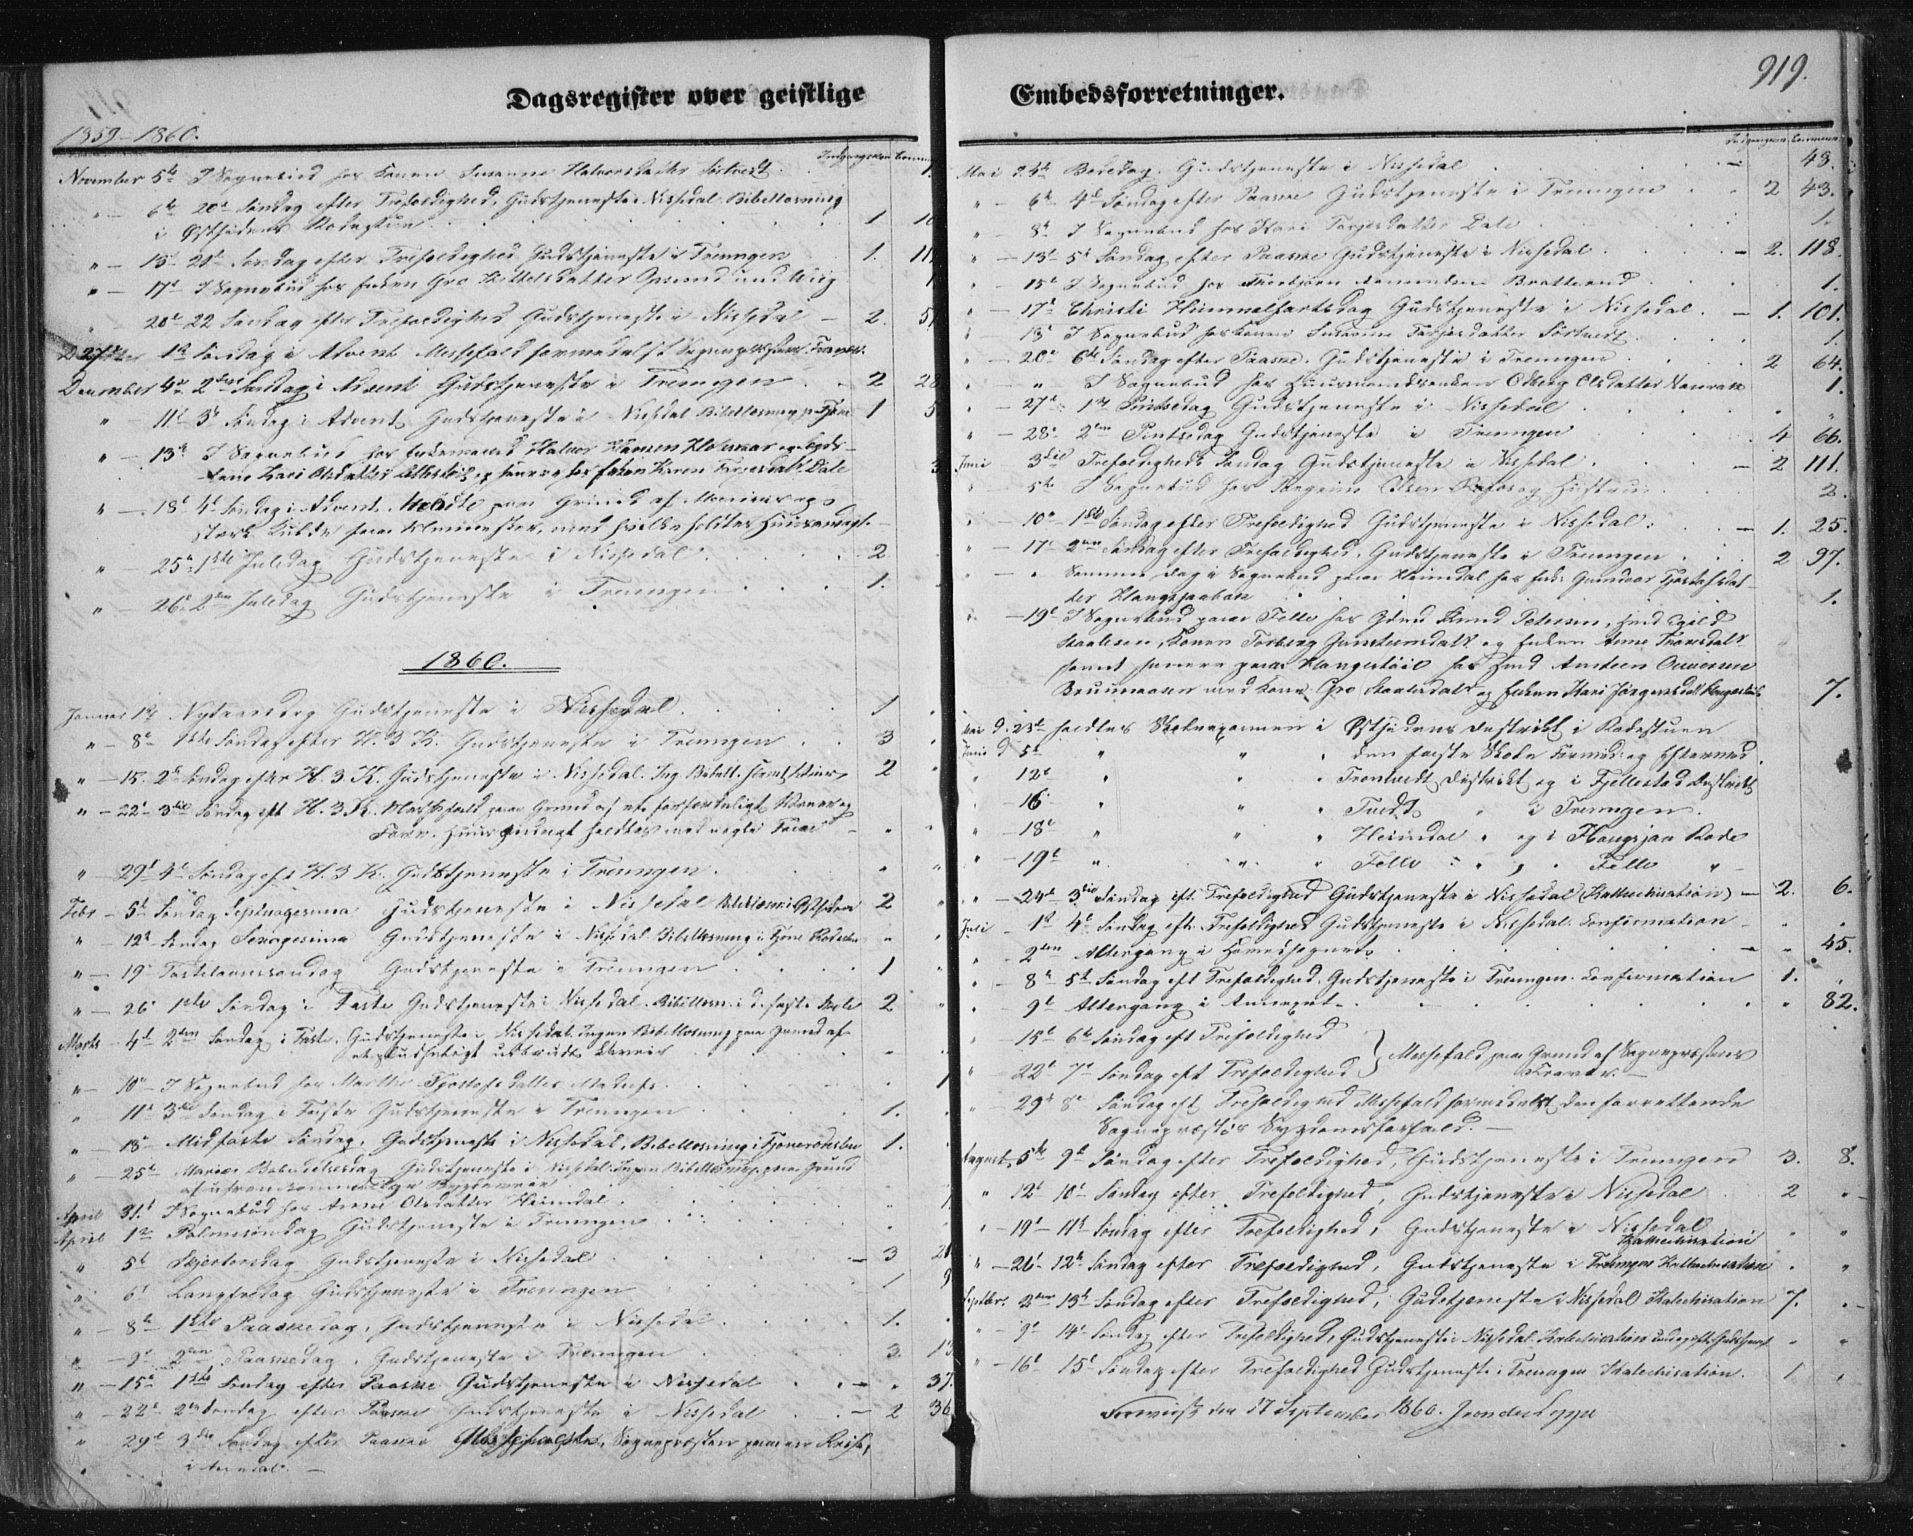 SAKO, Nissedal kirkebøker, F/Fa/L0003: Ministerialbok nr. I 3, 1846-1870, s. 918-919